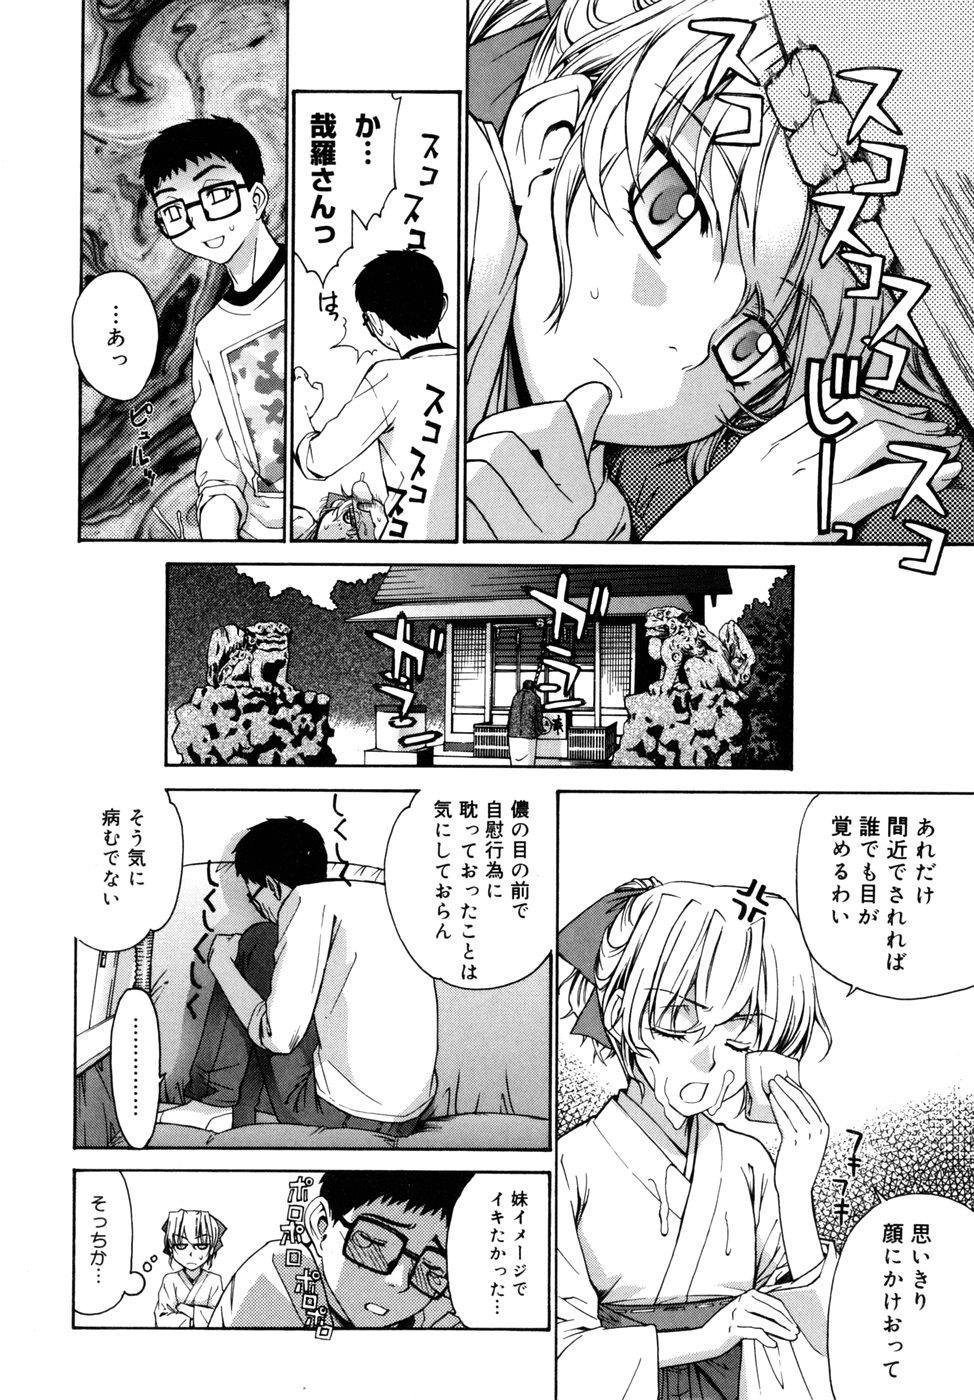 [Yaya Hinata] Tonari no Miko-san wa Minna Warau - The next shrine maidens smile in everyone. 131